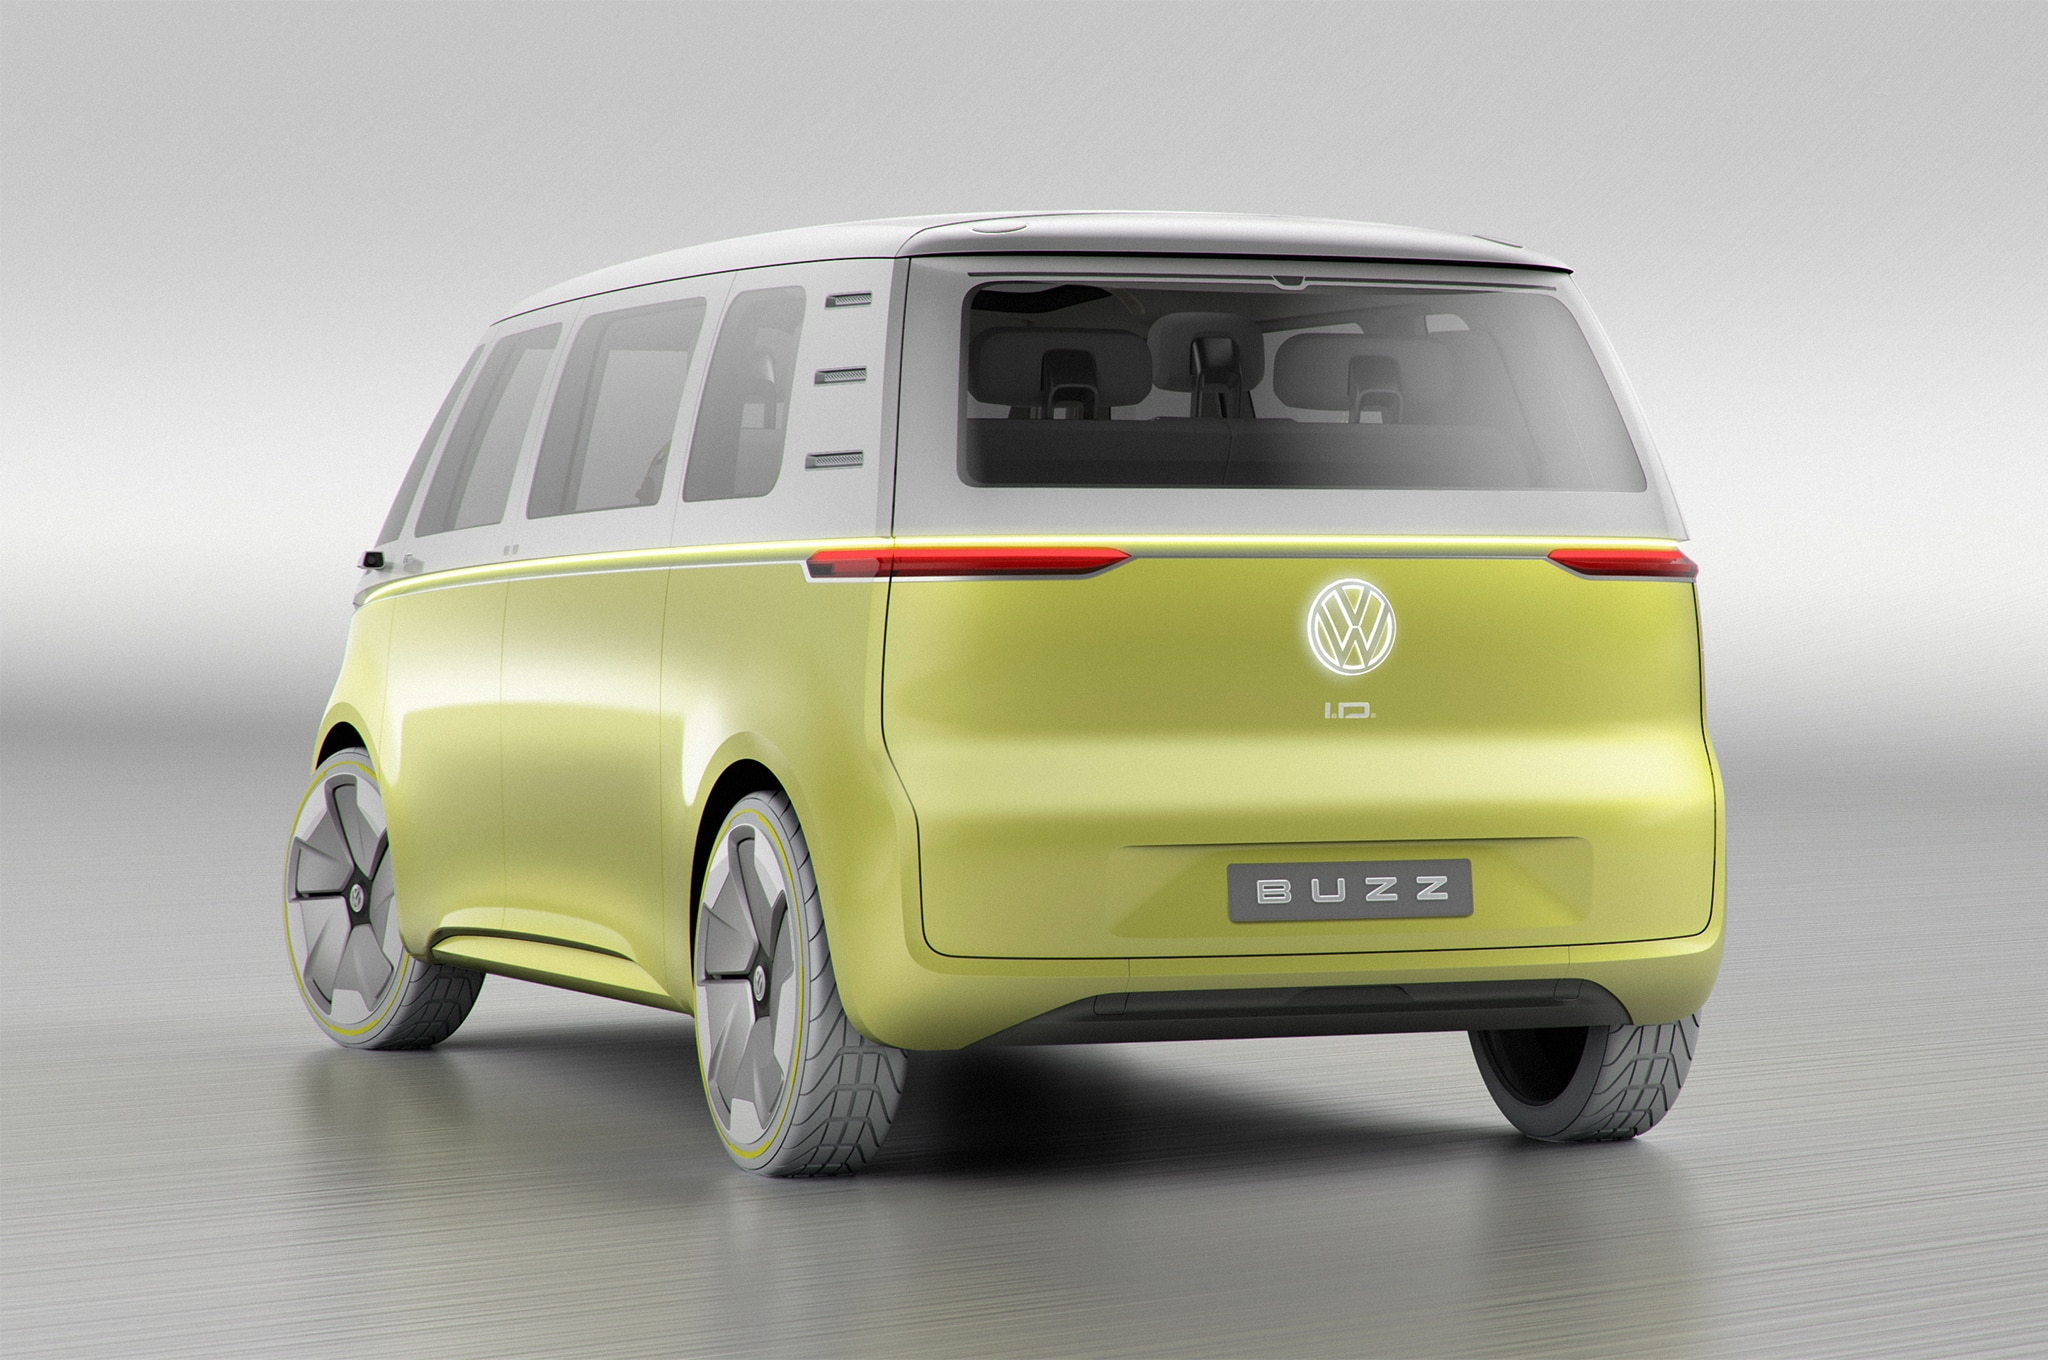 Volkswagen ID BUZZ Concept Rear Three Quarter 02 25